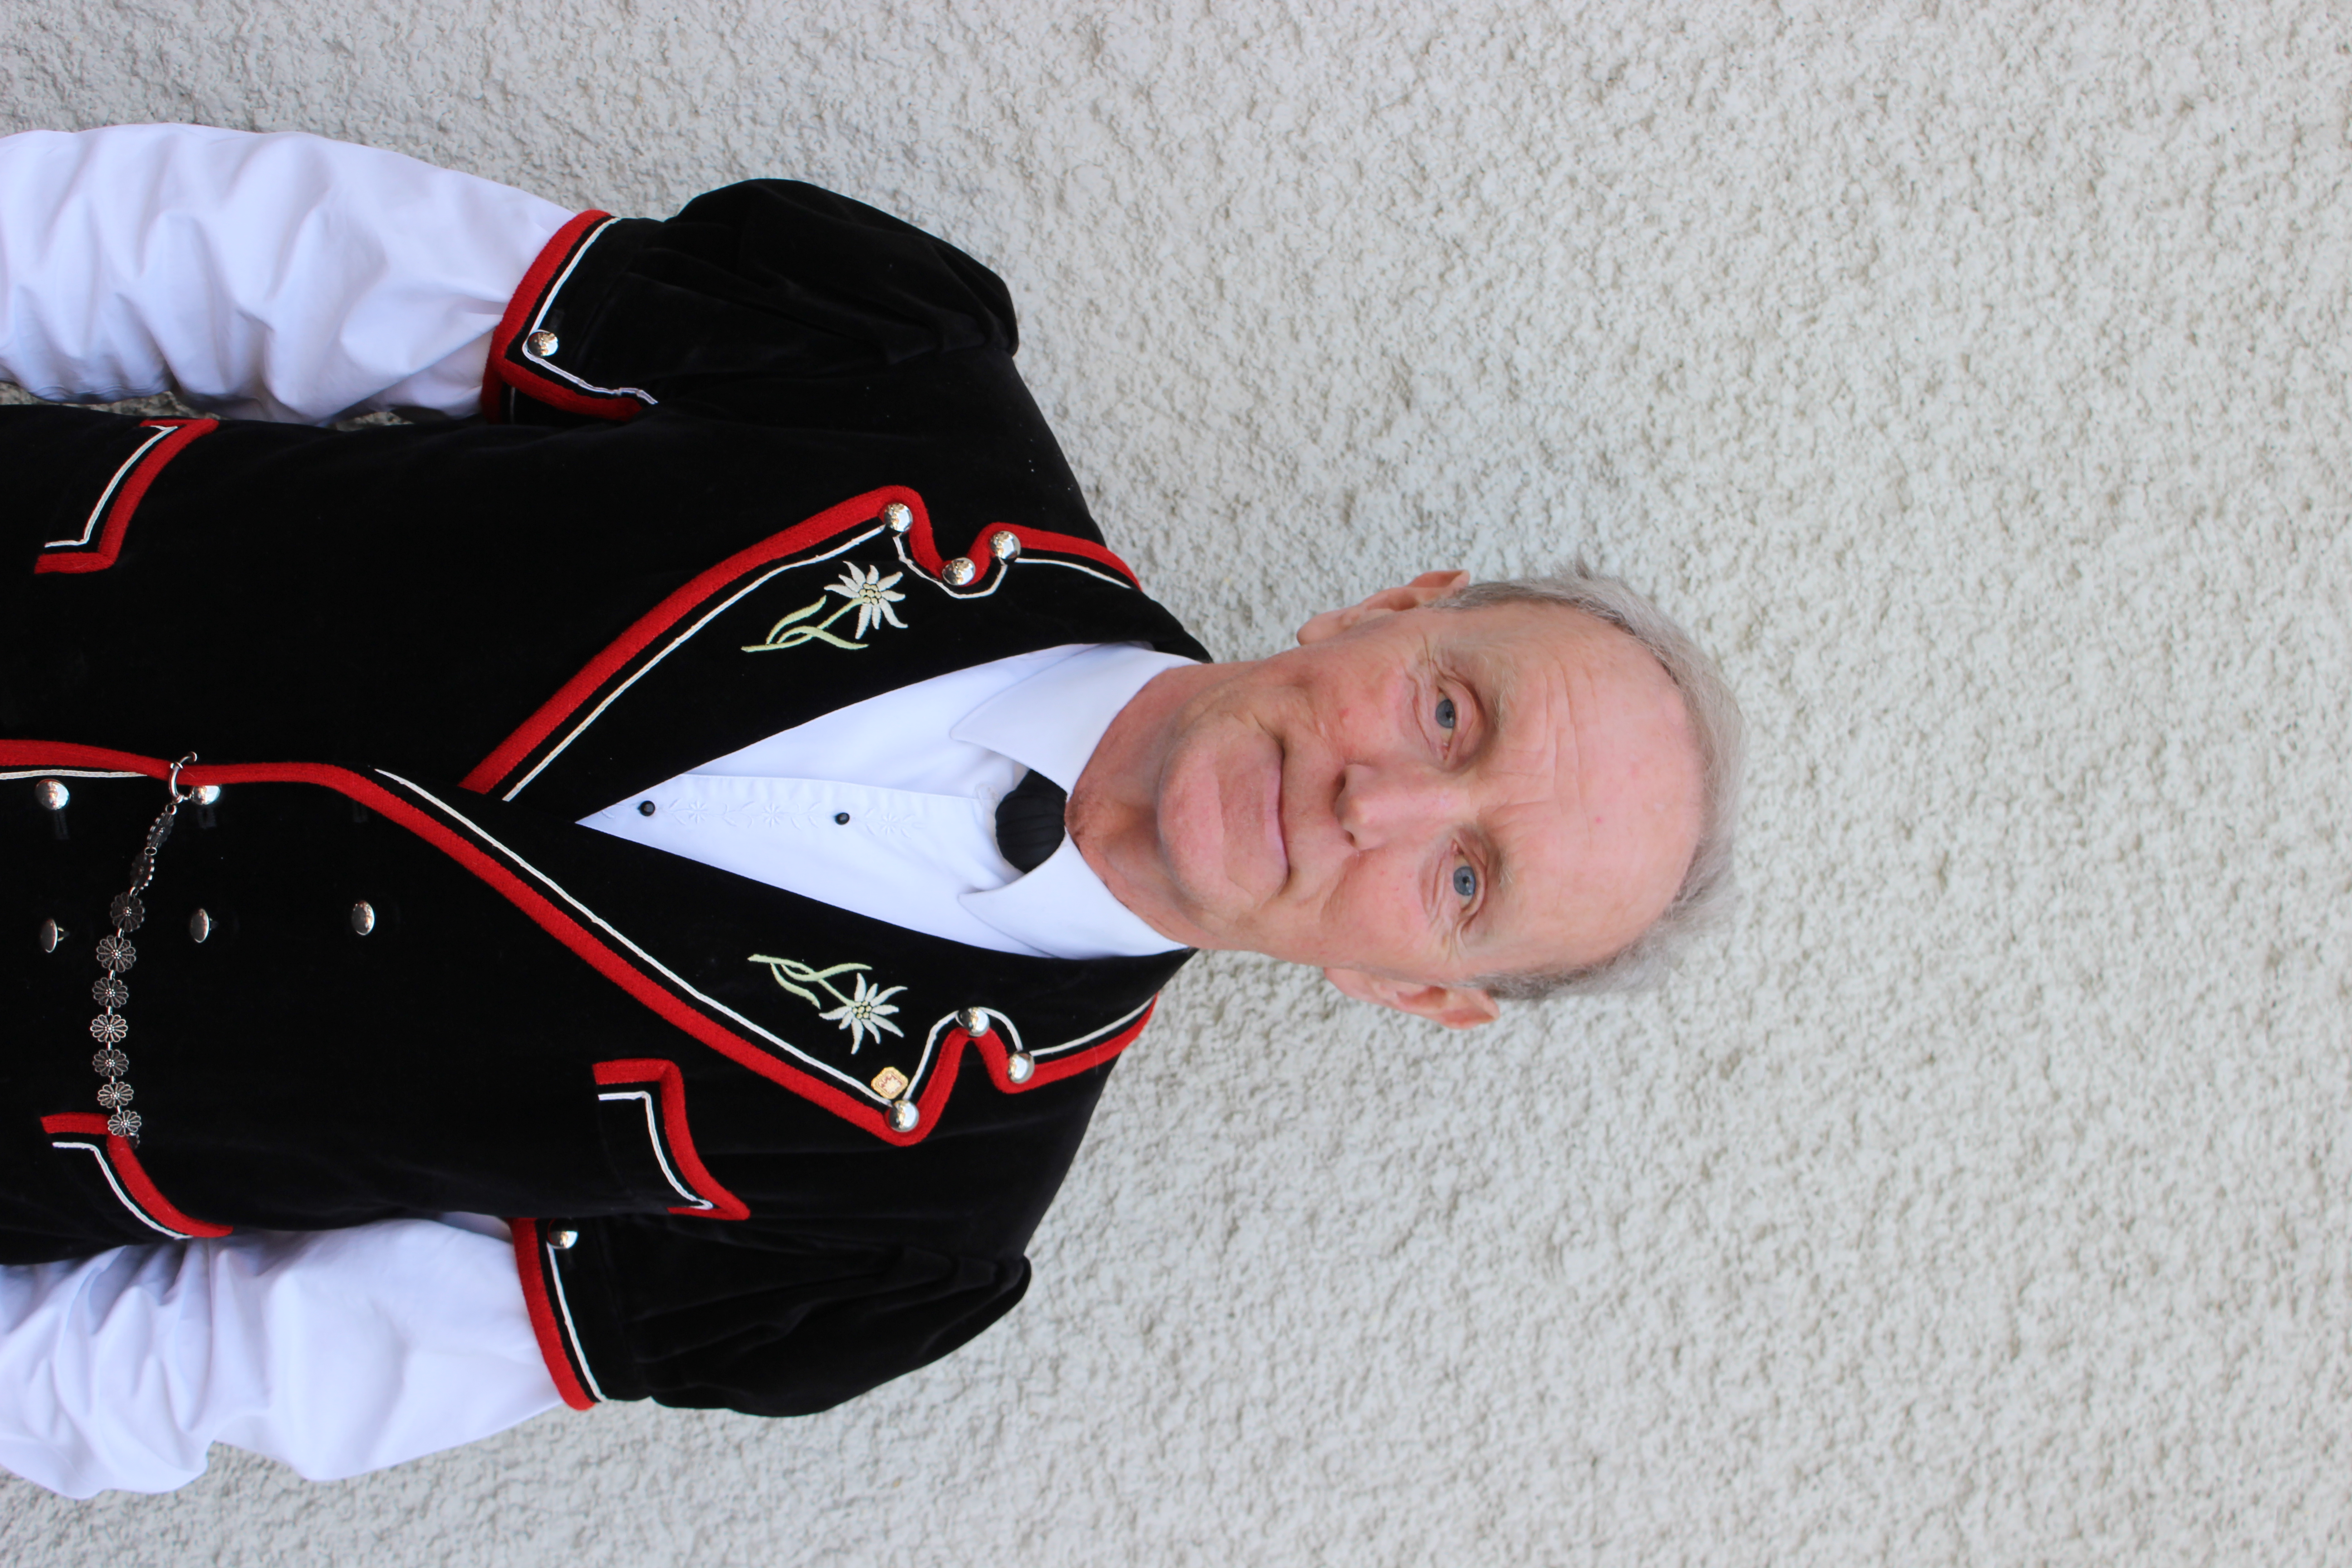 Ernst Jegerlehner